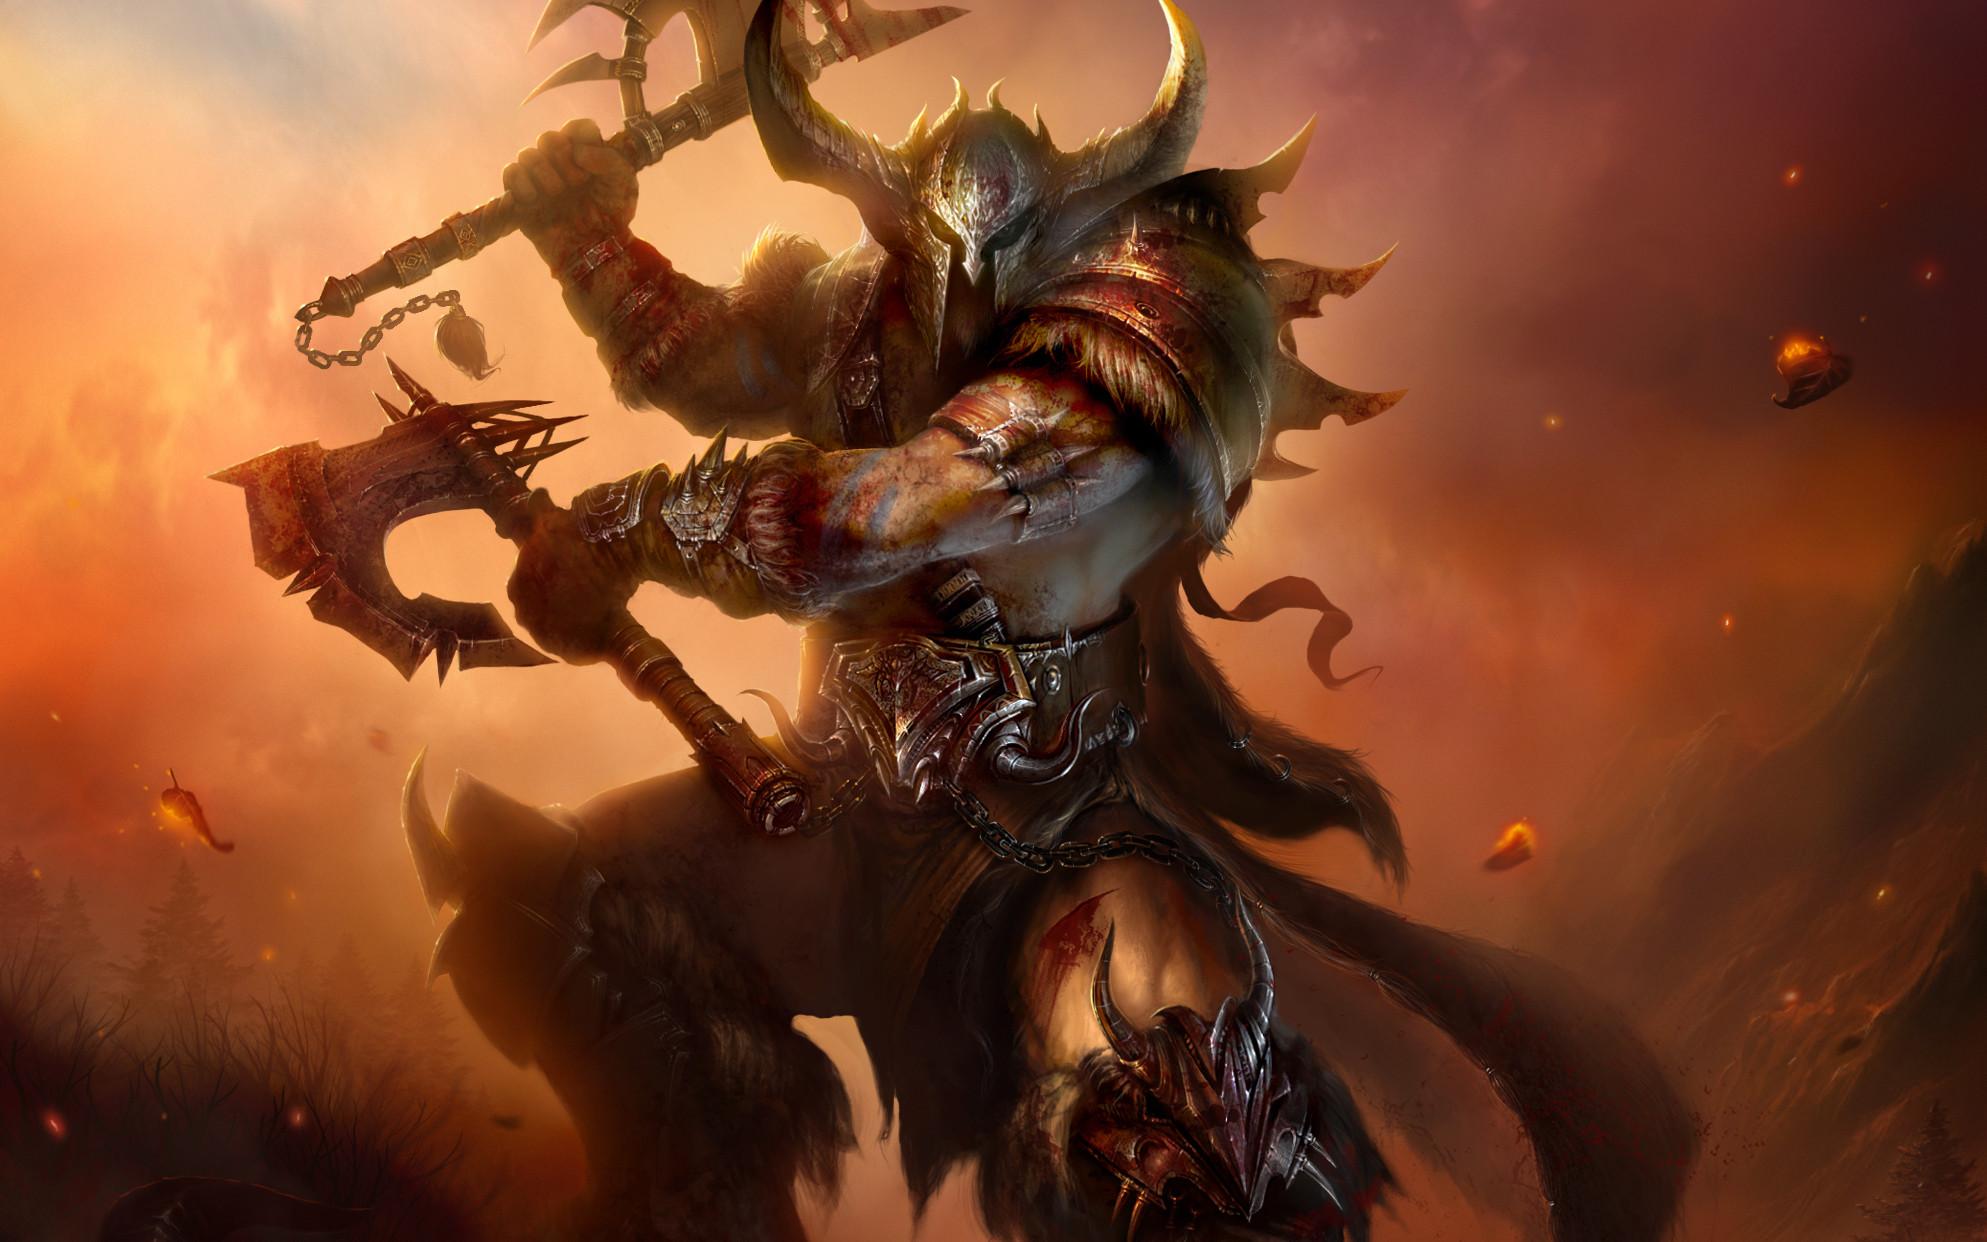 Diablo 3 Barbarian Wallpaper 1920x1080